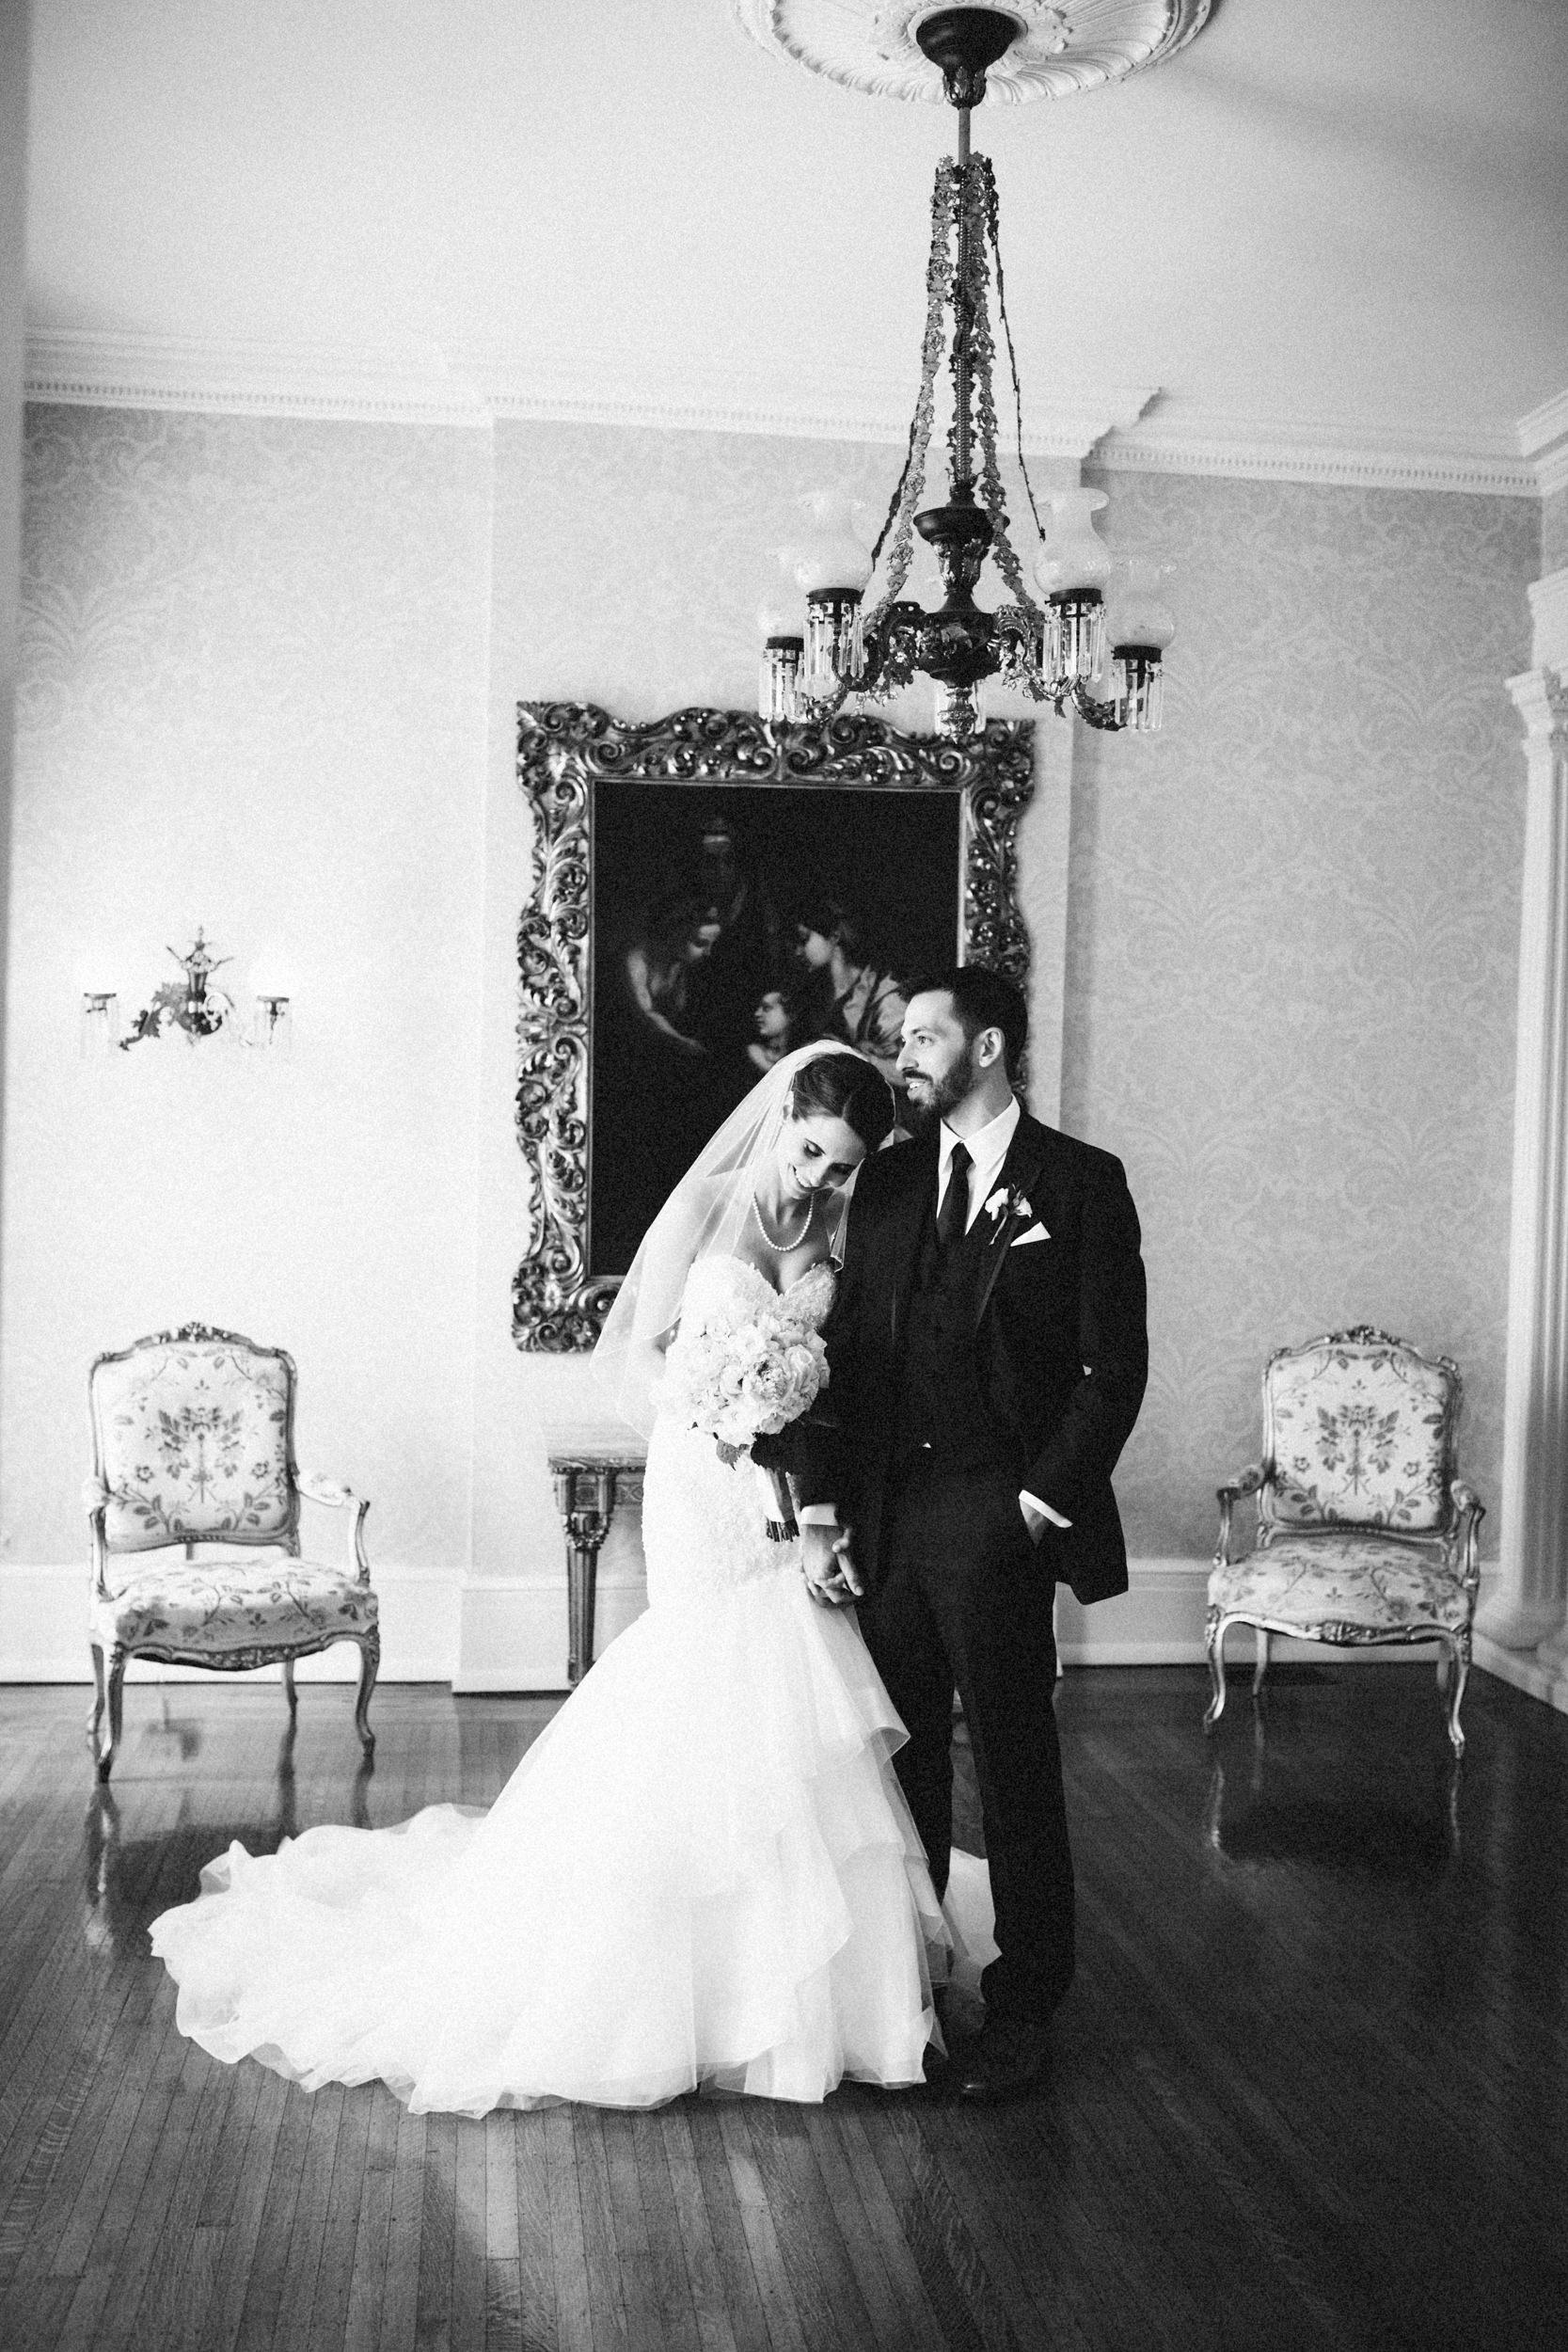 Louisville-Kentucky-Wedding-Elopement-Photographer-Sarah-Katherine-Davis-Photography-Whitehall-Classic-Timeless-Garden-Wedding-472.jpg